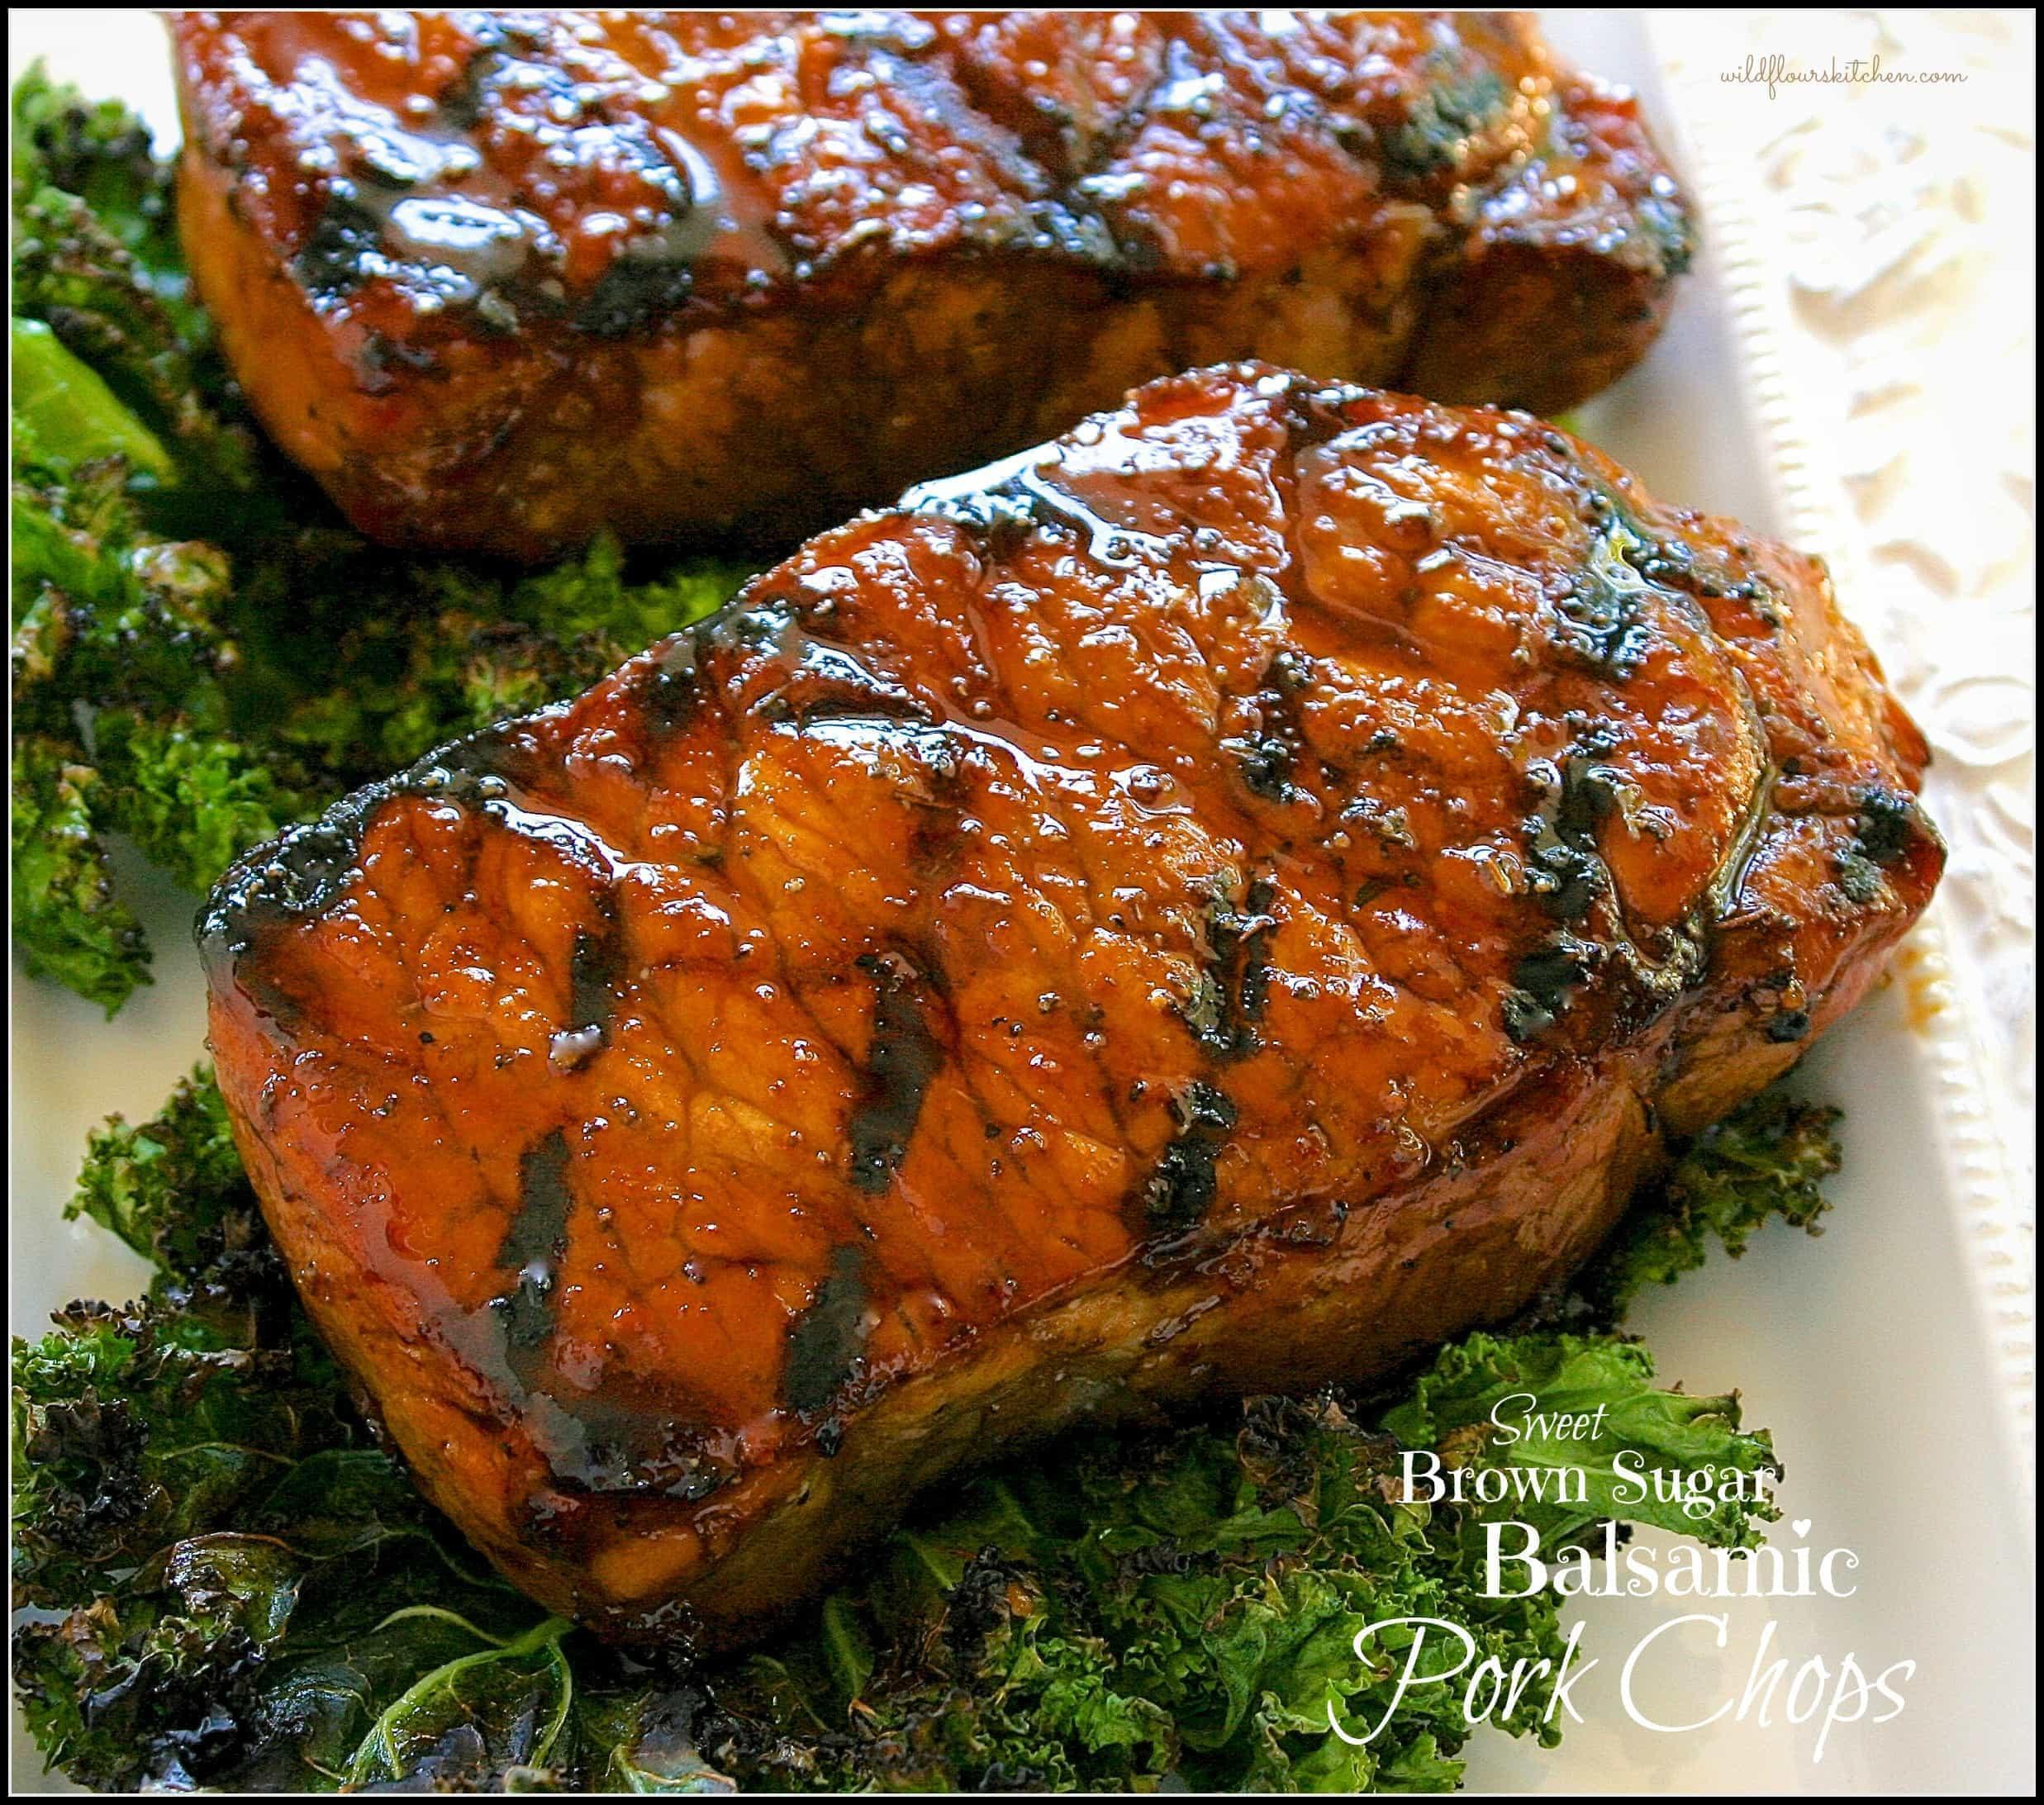 Brown Sugar Glazed Pork Chops  Caramelized Balsamic & Brown Sugar Glazed Pork Loin Chops